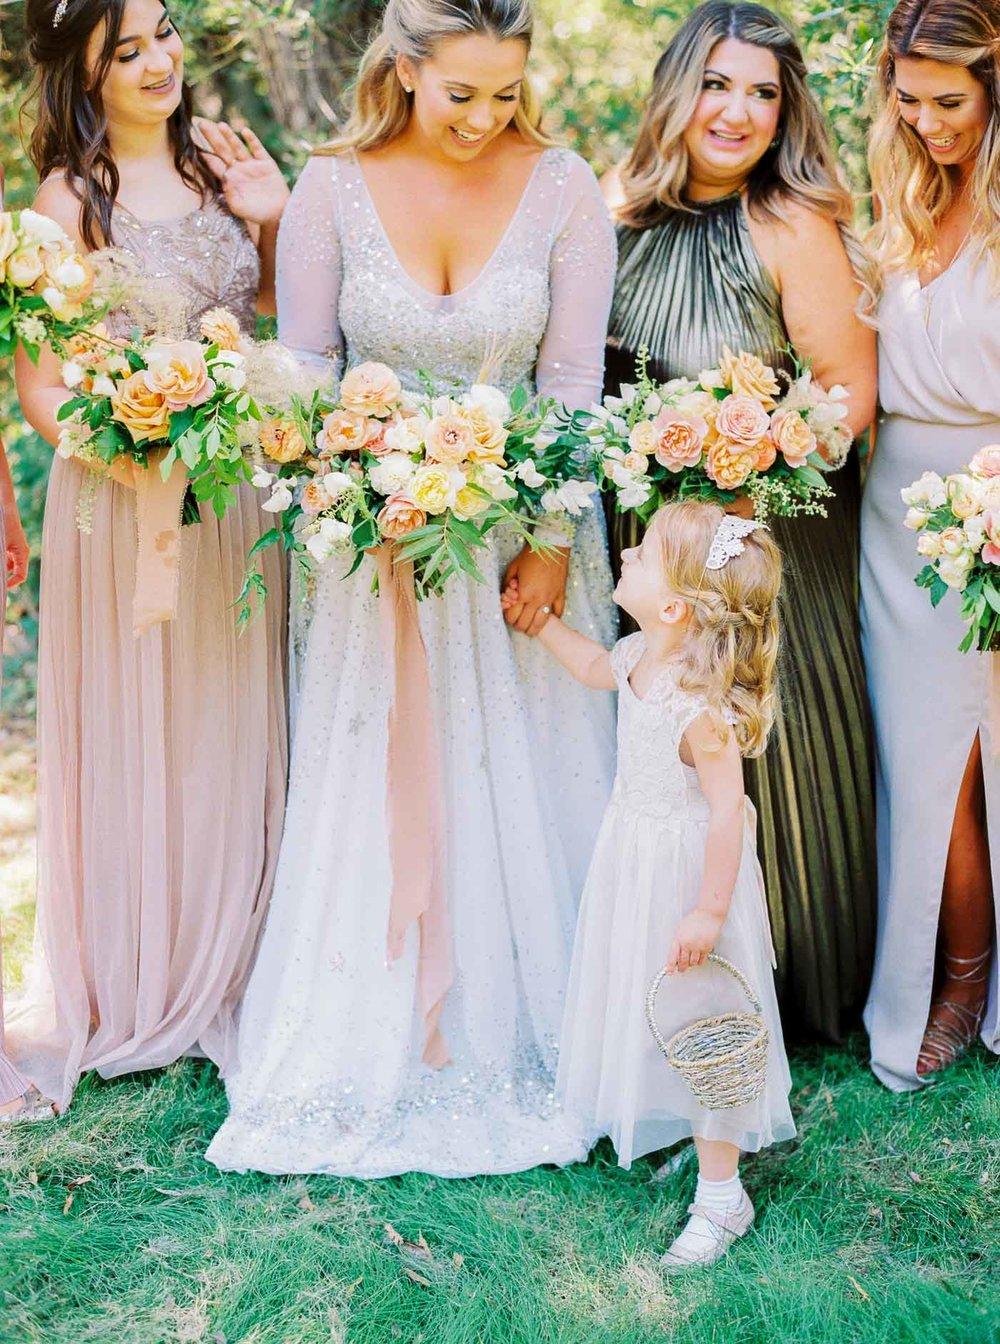 Gardener Ranch wedding-19.jpg